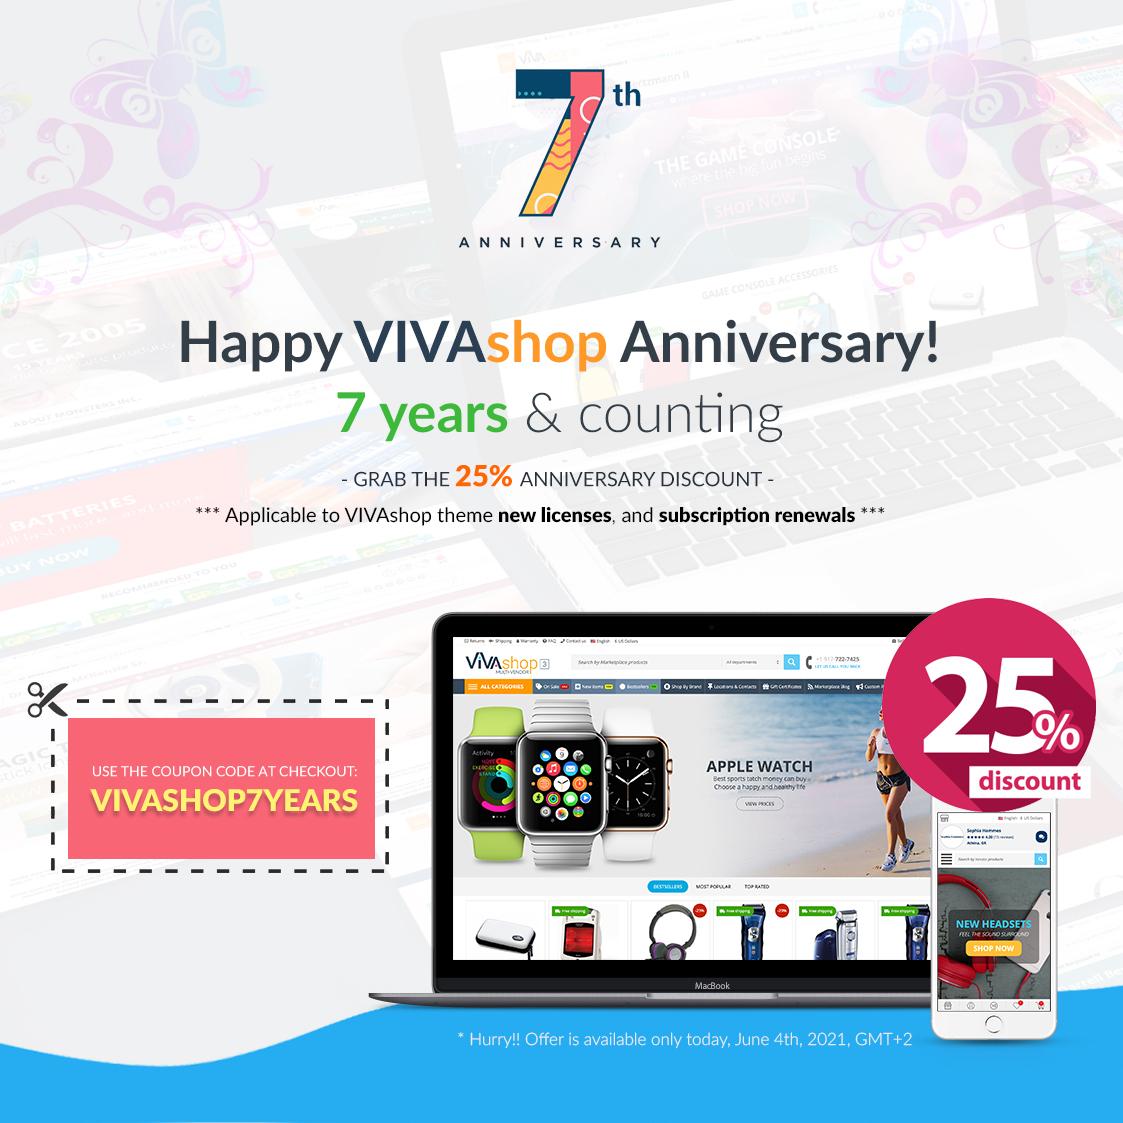 MP-VIVAshop-7th-anniversary.jpg